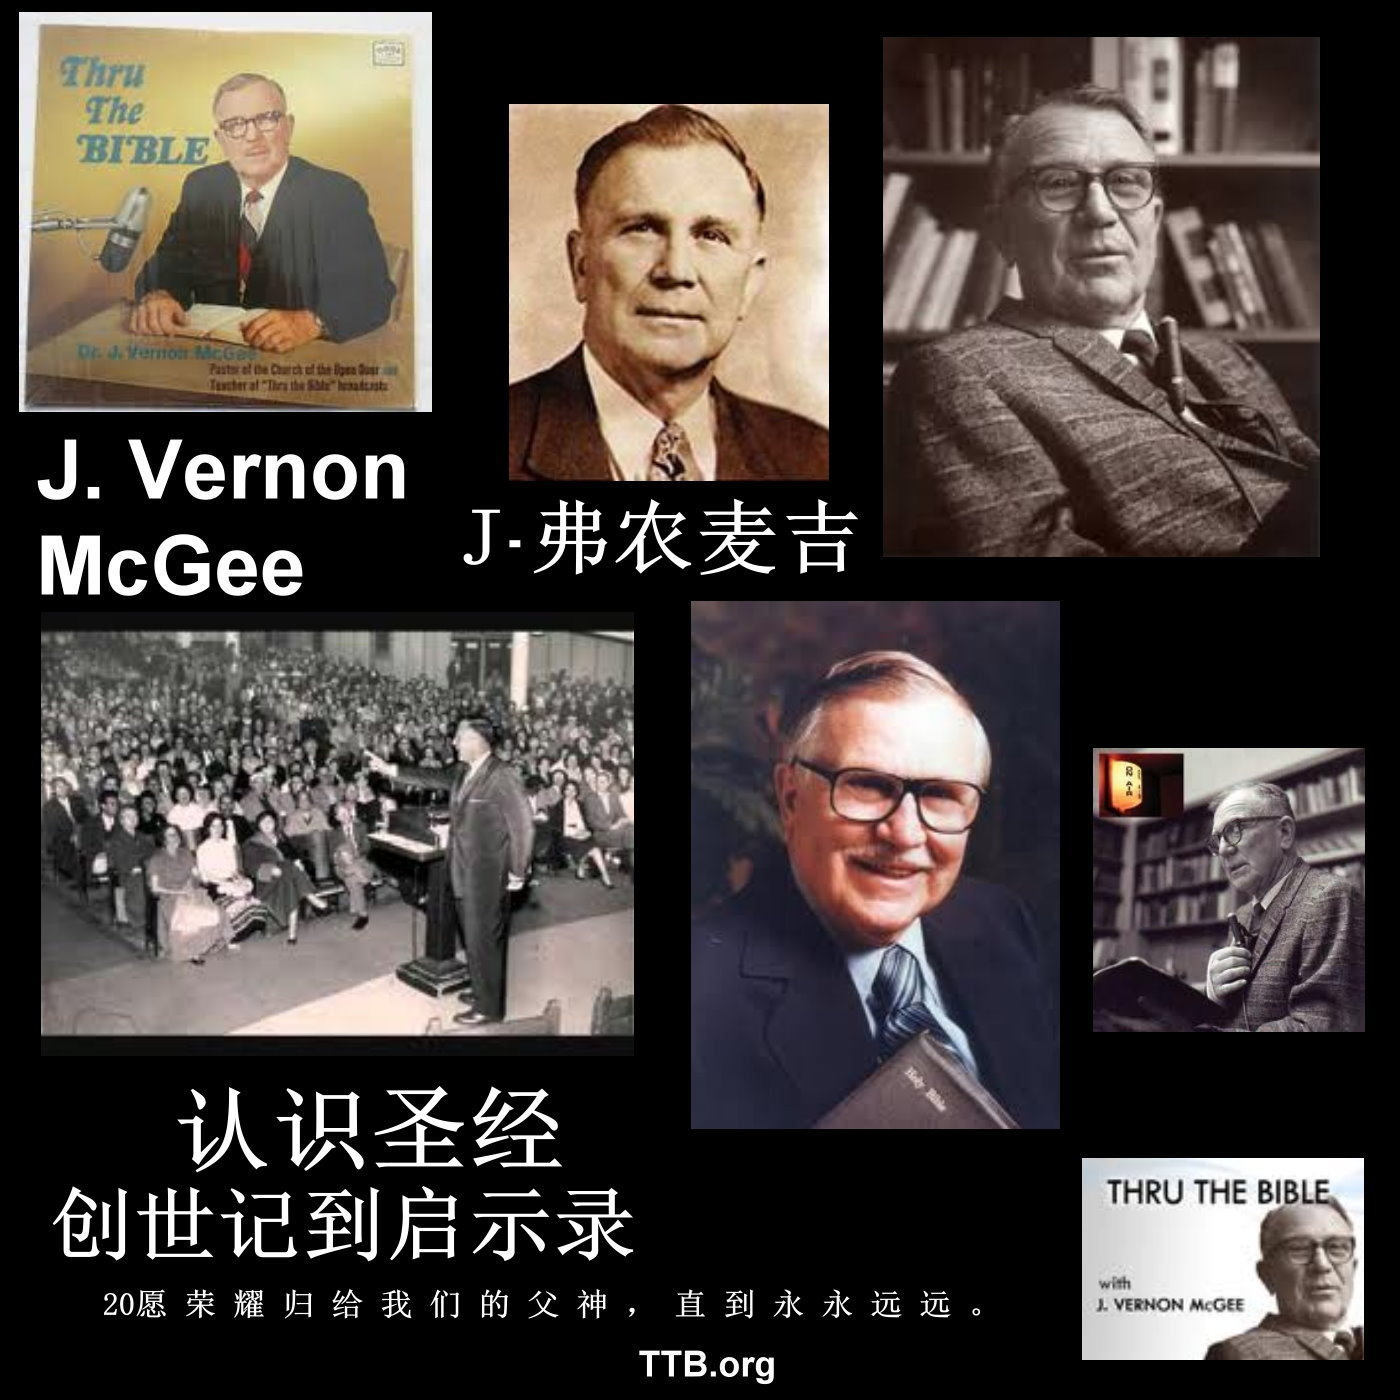 J 弗农麦基 - 认识圣经 - 新约圣经第1部分 - J Vernon McGee - Chinese Mandarin